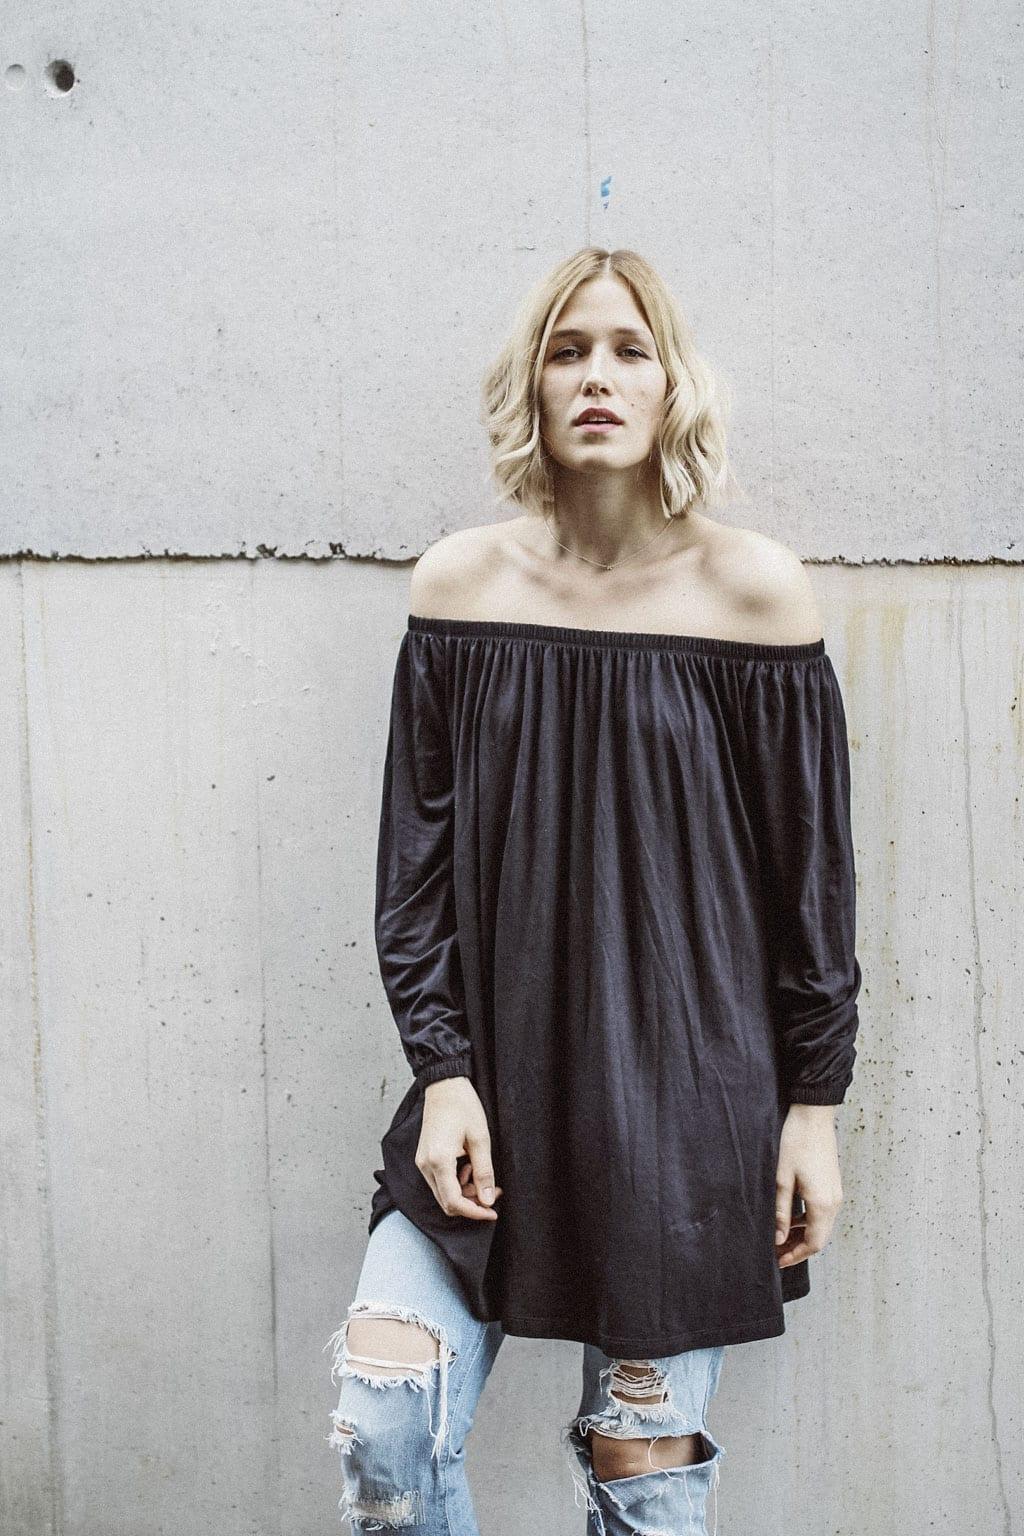 Constantly-K-tifmys-fashion-street-style-minimalism-blog-salzburg-blogger-anna-2086